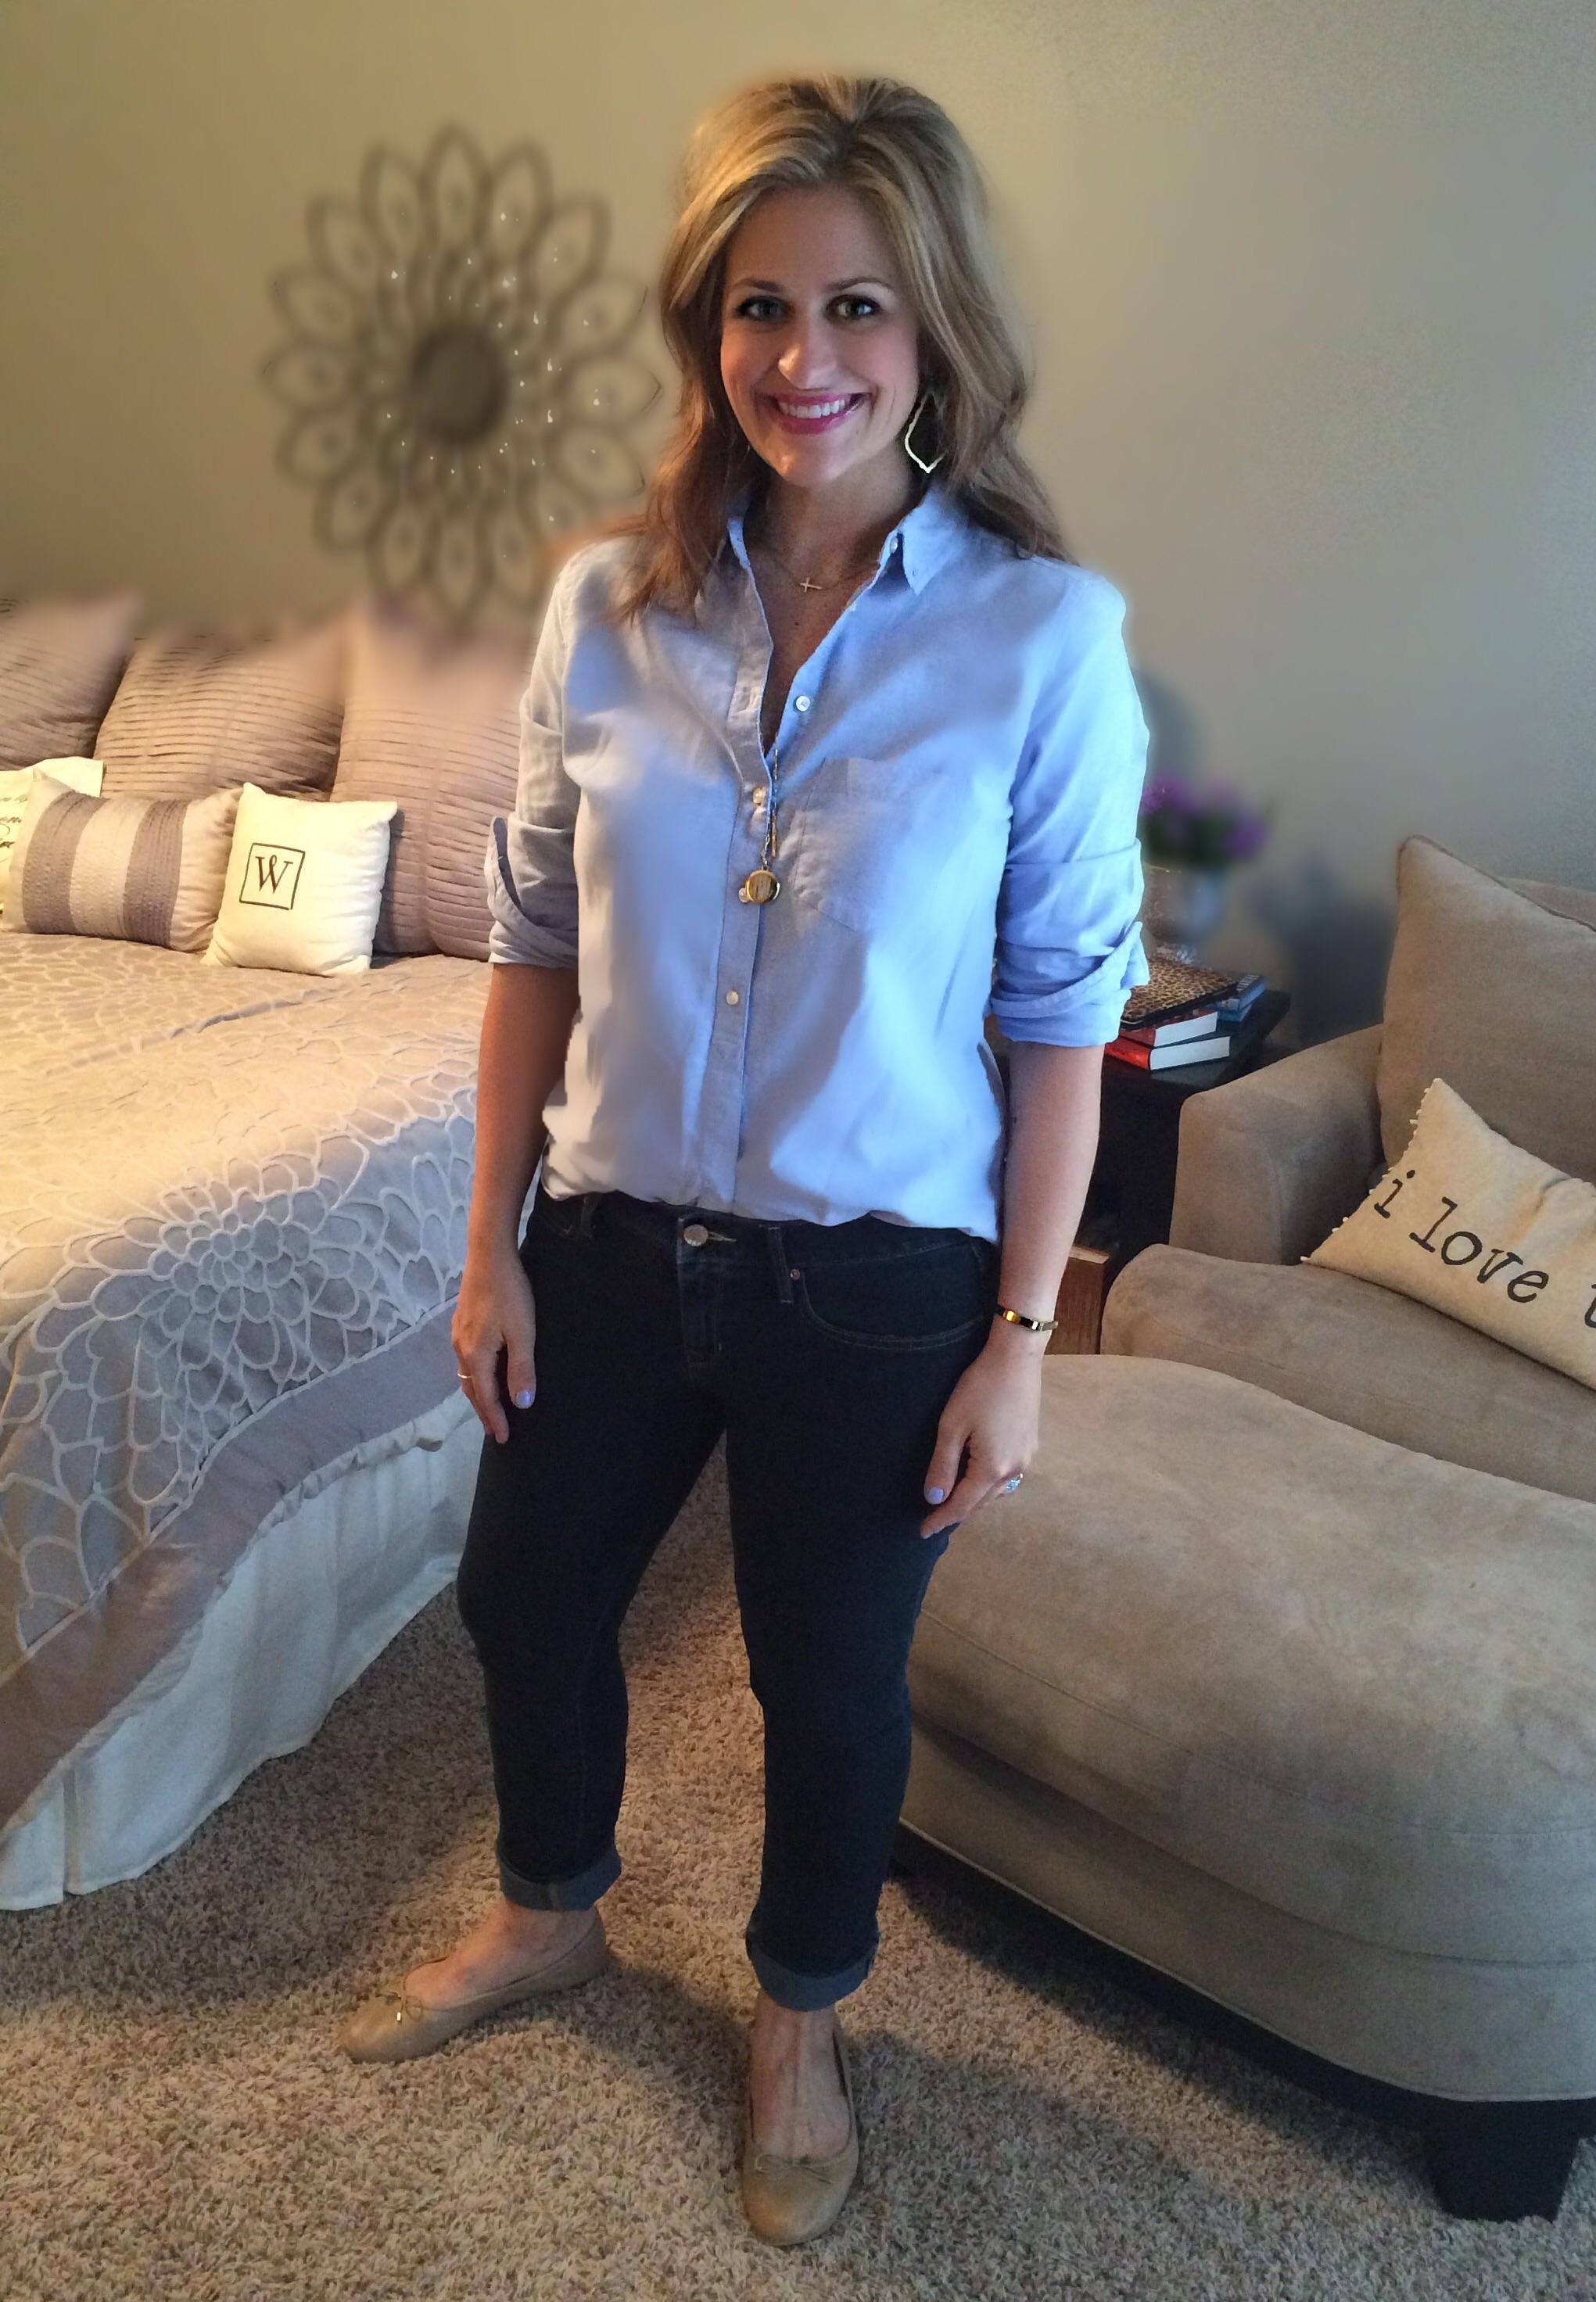 Jeans:  Gap Always Skinny  Shirt:  Gap Oxford  Necklaces: Both Stella & Dot ( sideways cross  &  engravable locket ) Earrings:  Kendra Scott  Shoes:  Sam Edelman